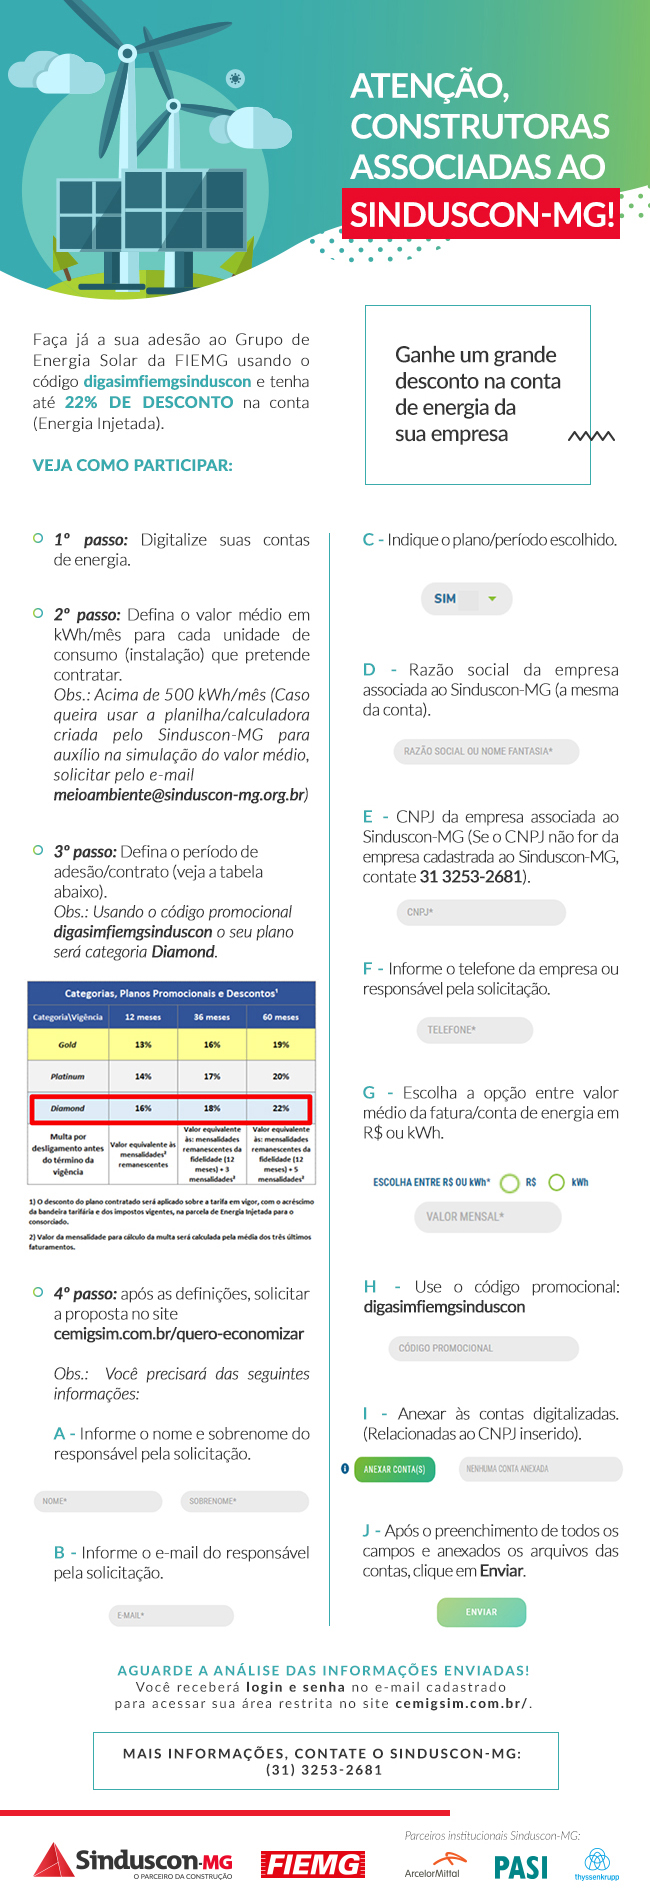 SI-10818-AGO19-Email-mkt-_Desconto-de-Energia-para-sua-Empresa_B